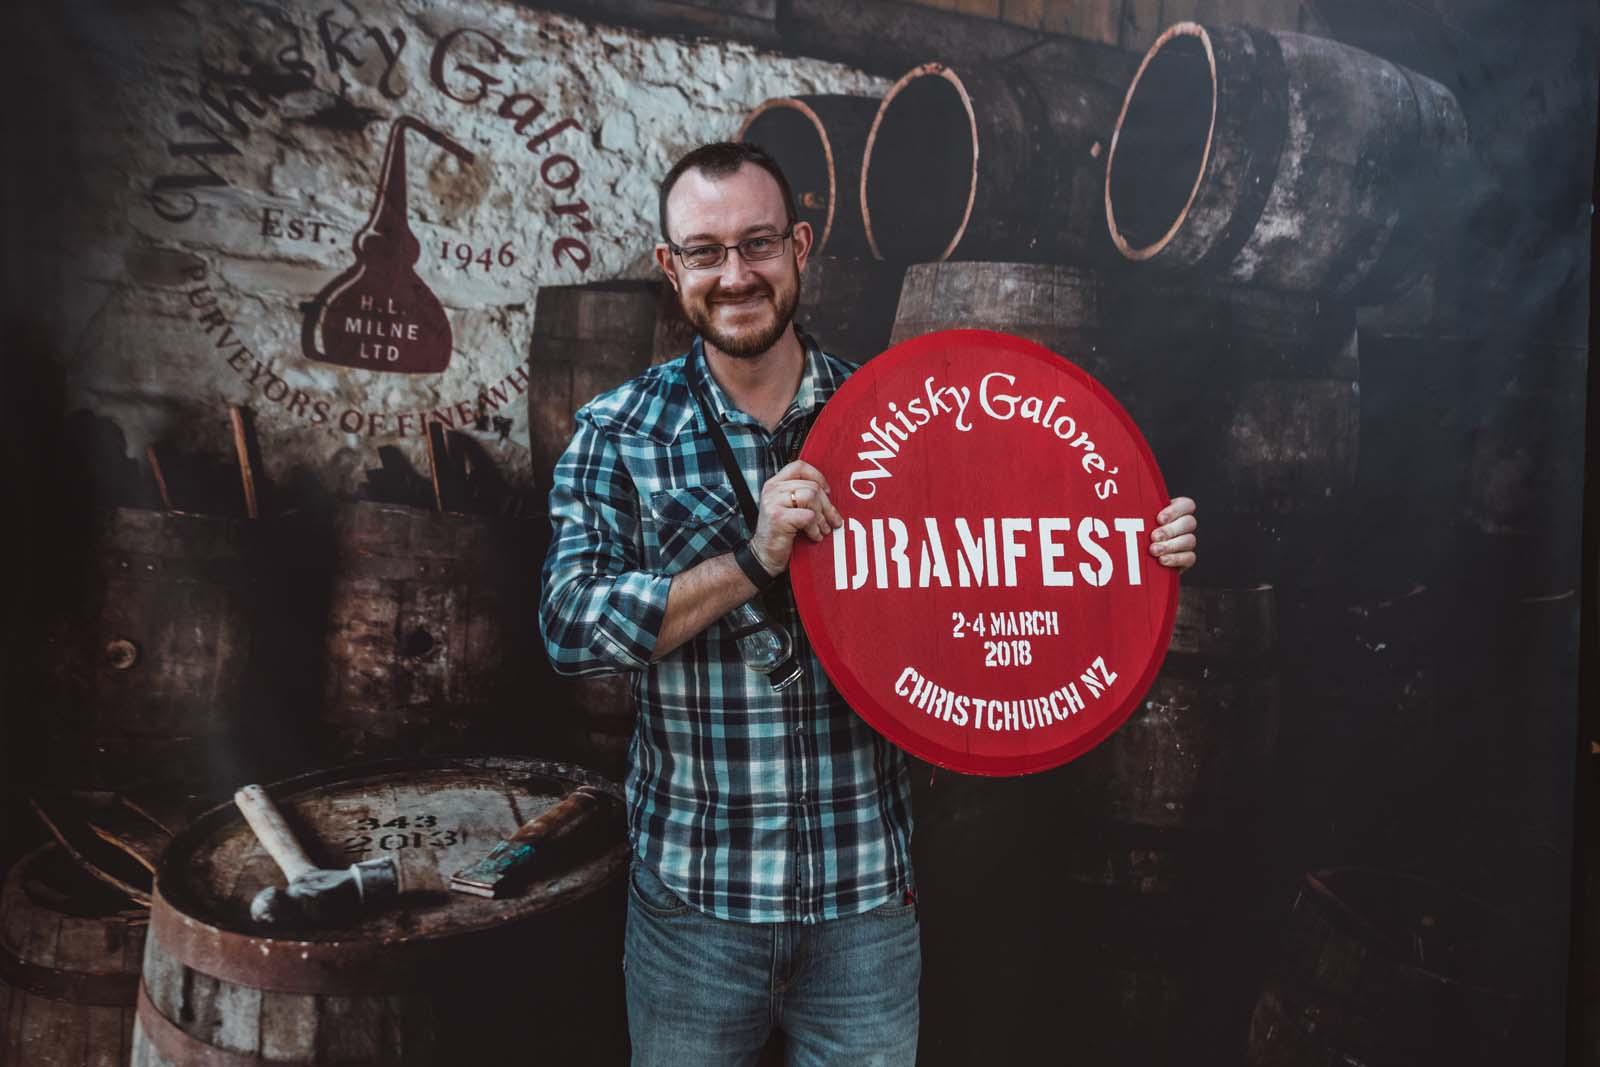 Dramfest 2018 for Whisky Galore-137.jpg